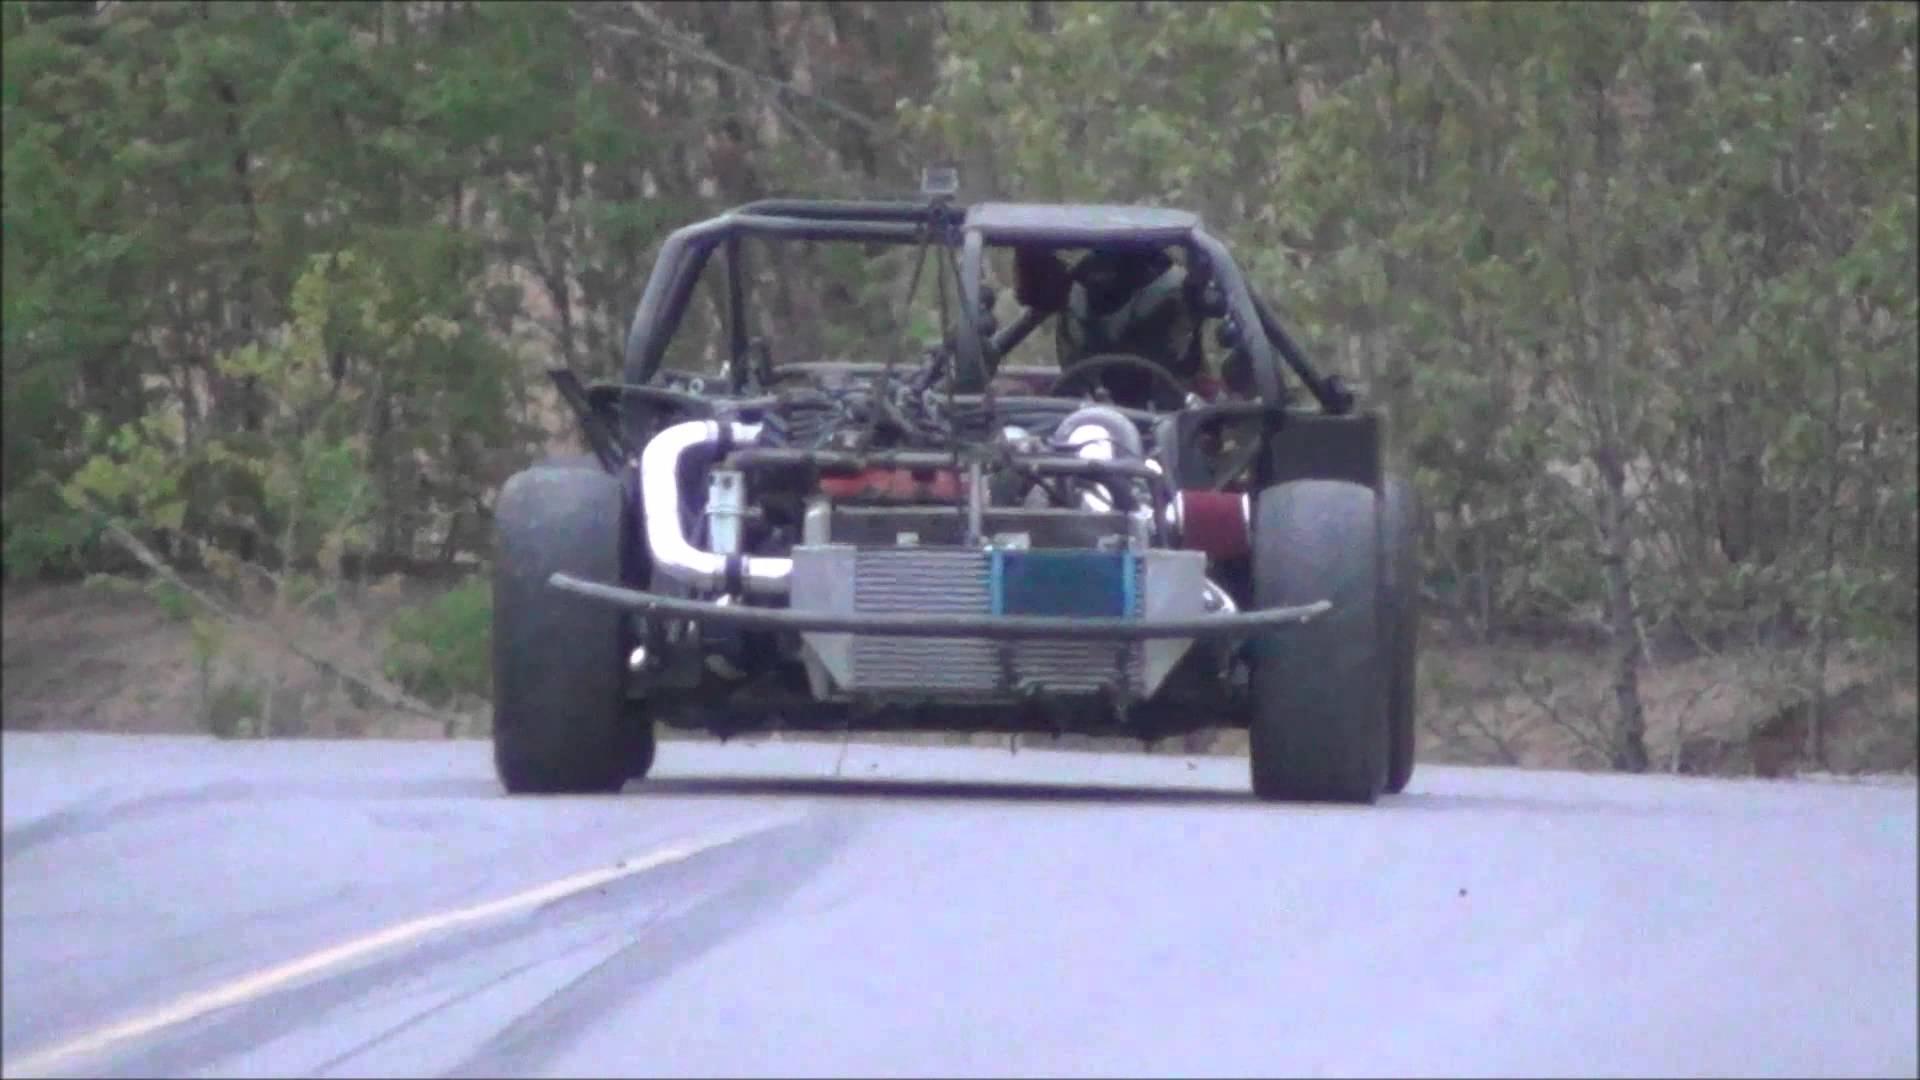 this-1300hp-awd-car-has-two-engi-1